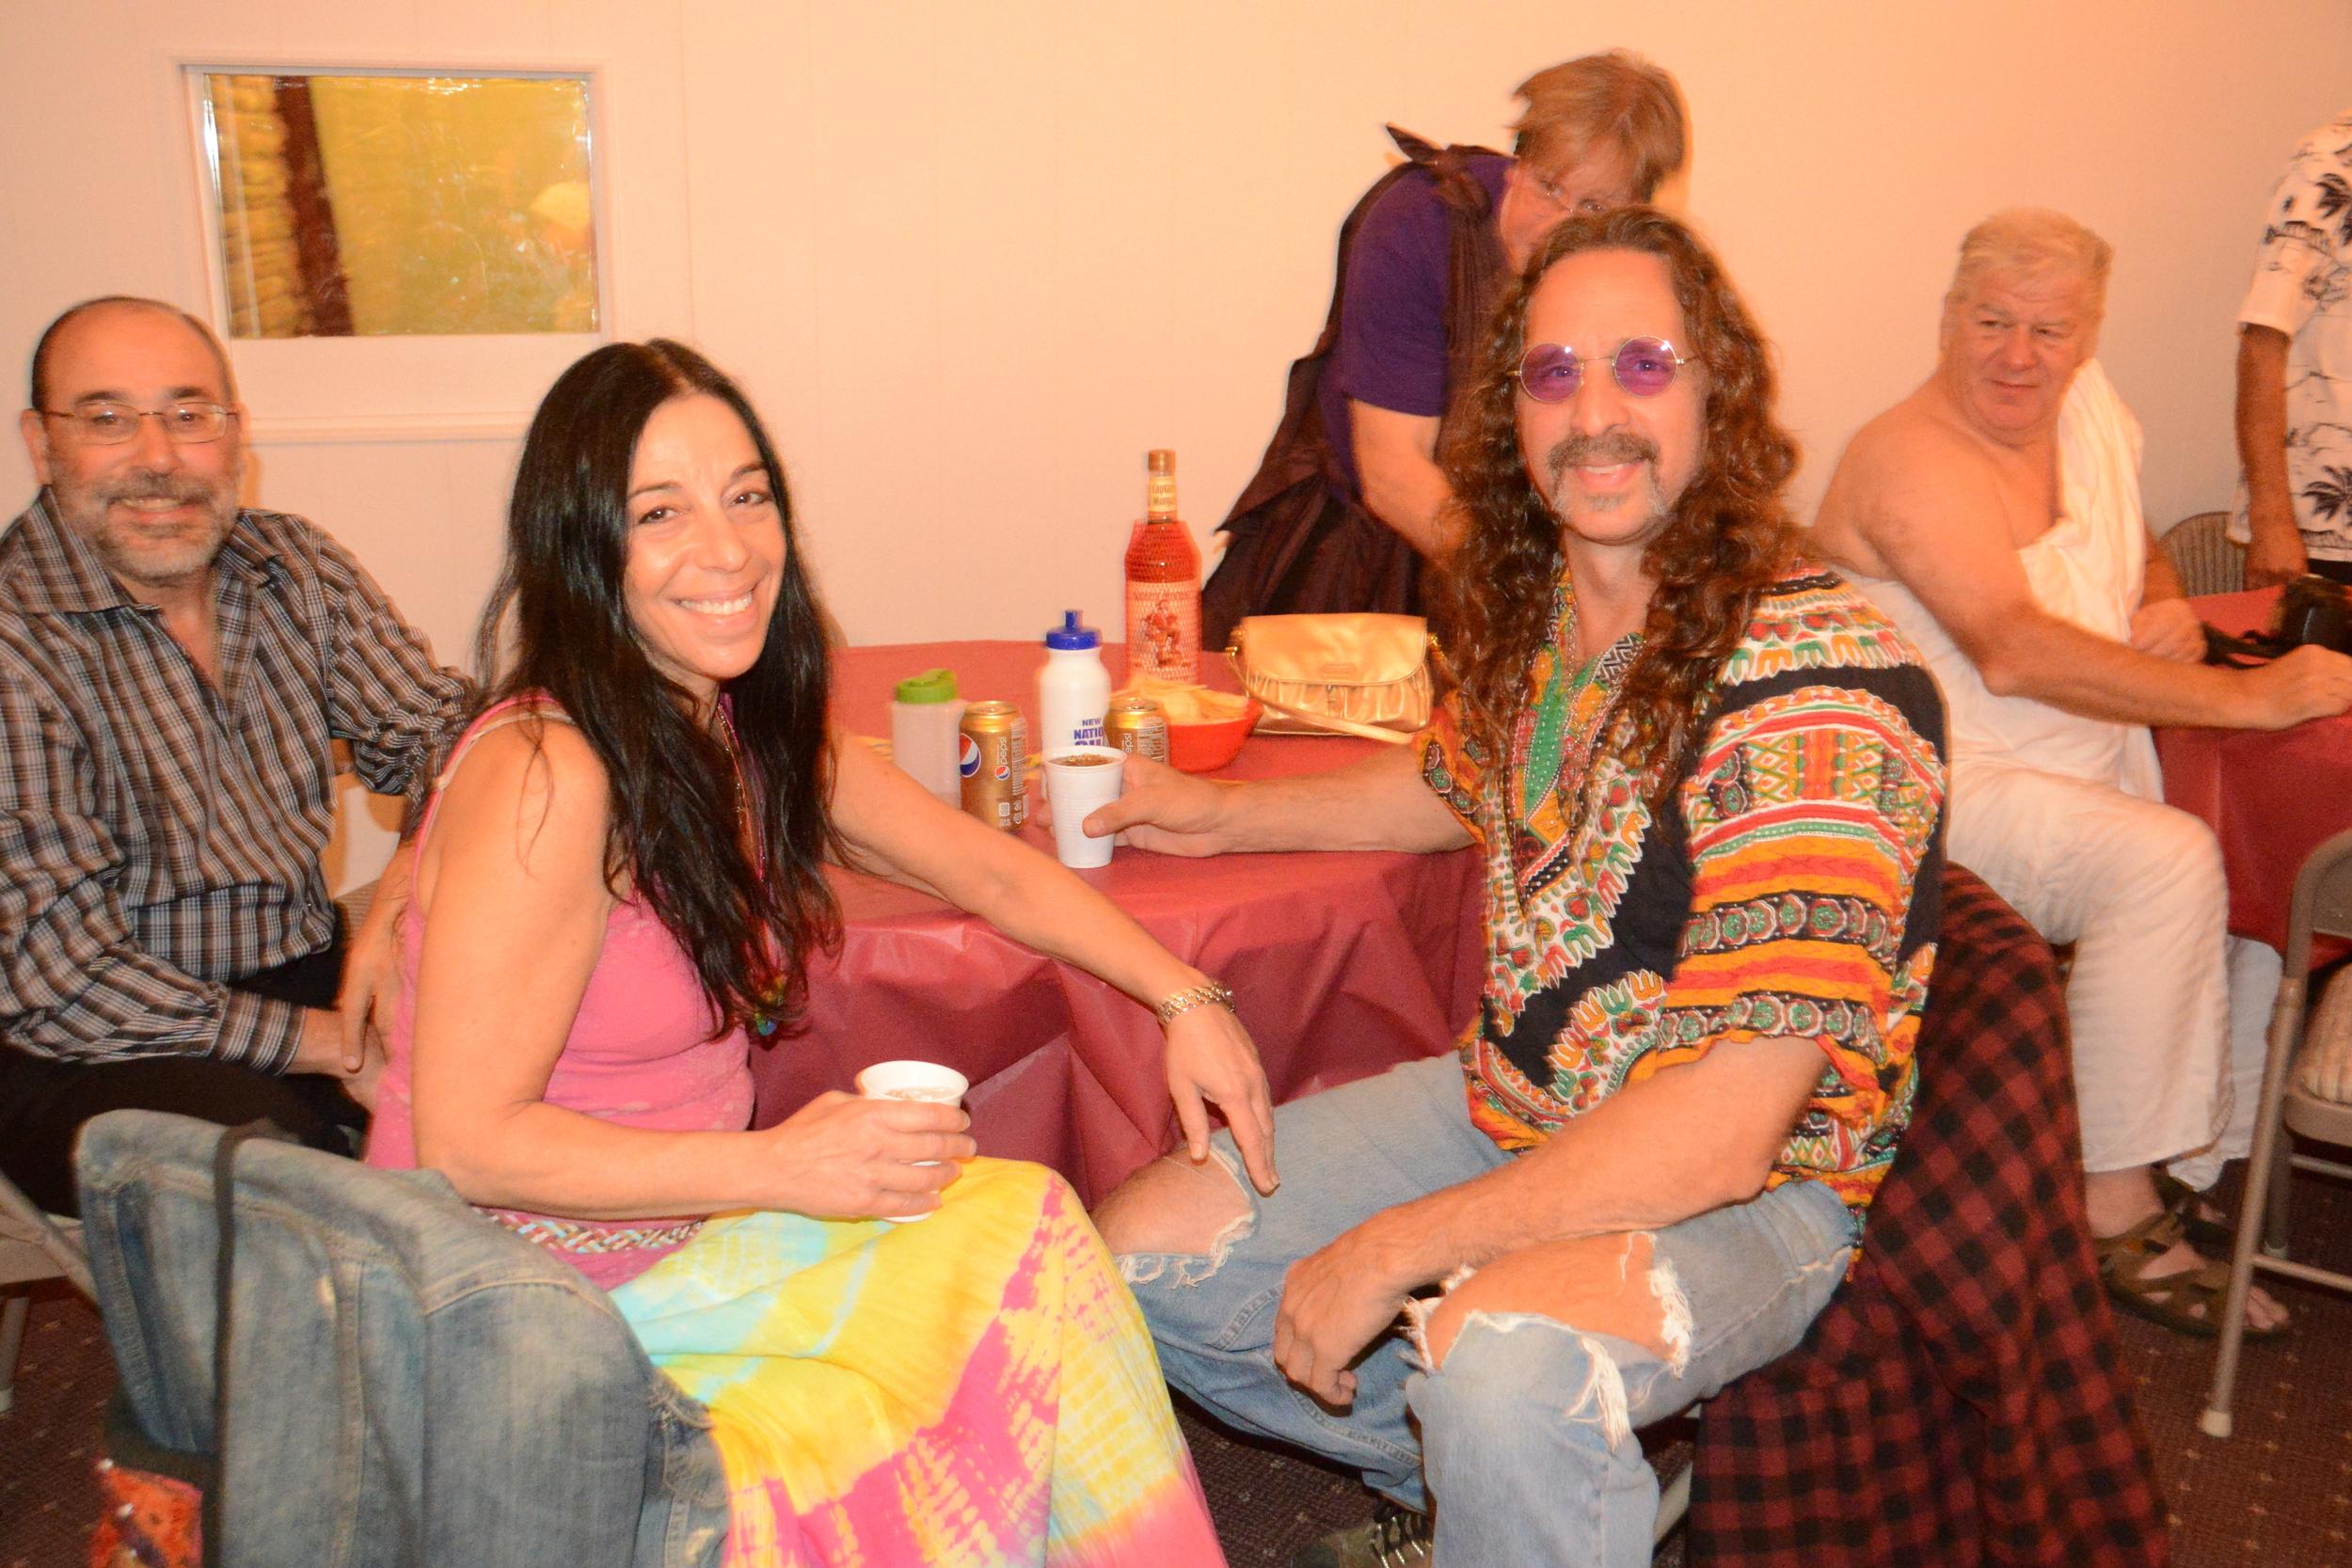 2012 10-27 Dance Magic Halloween party (3).JPG